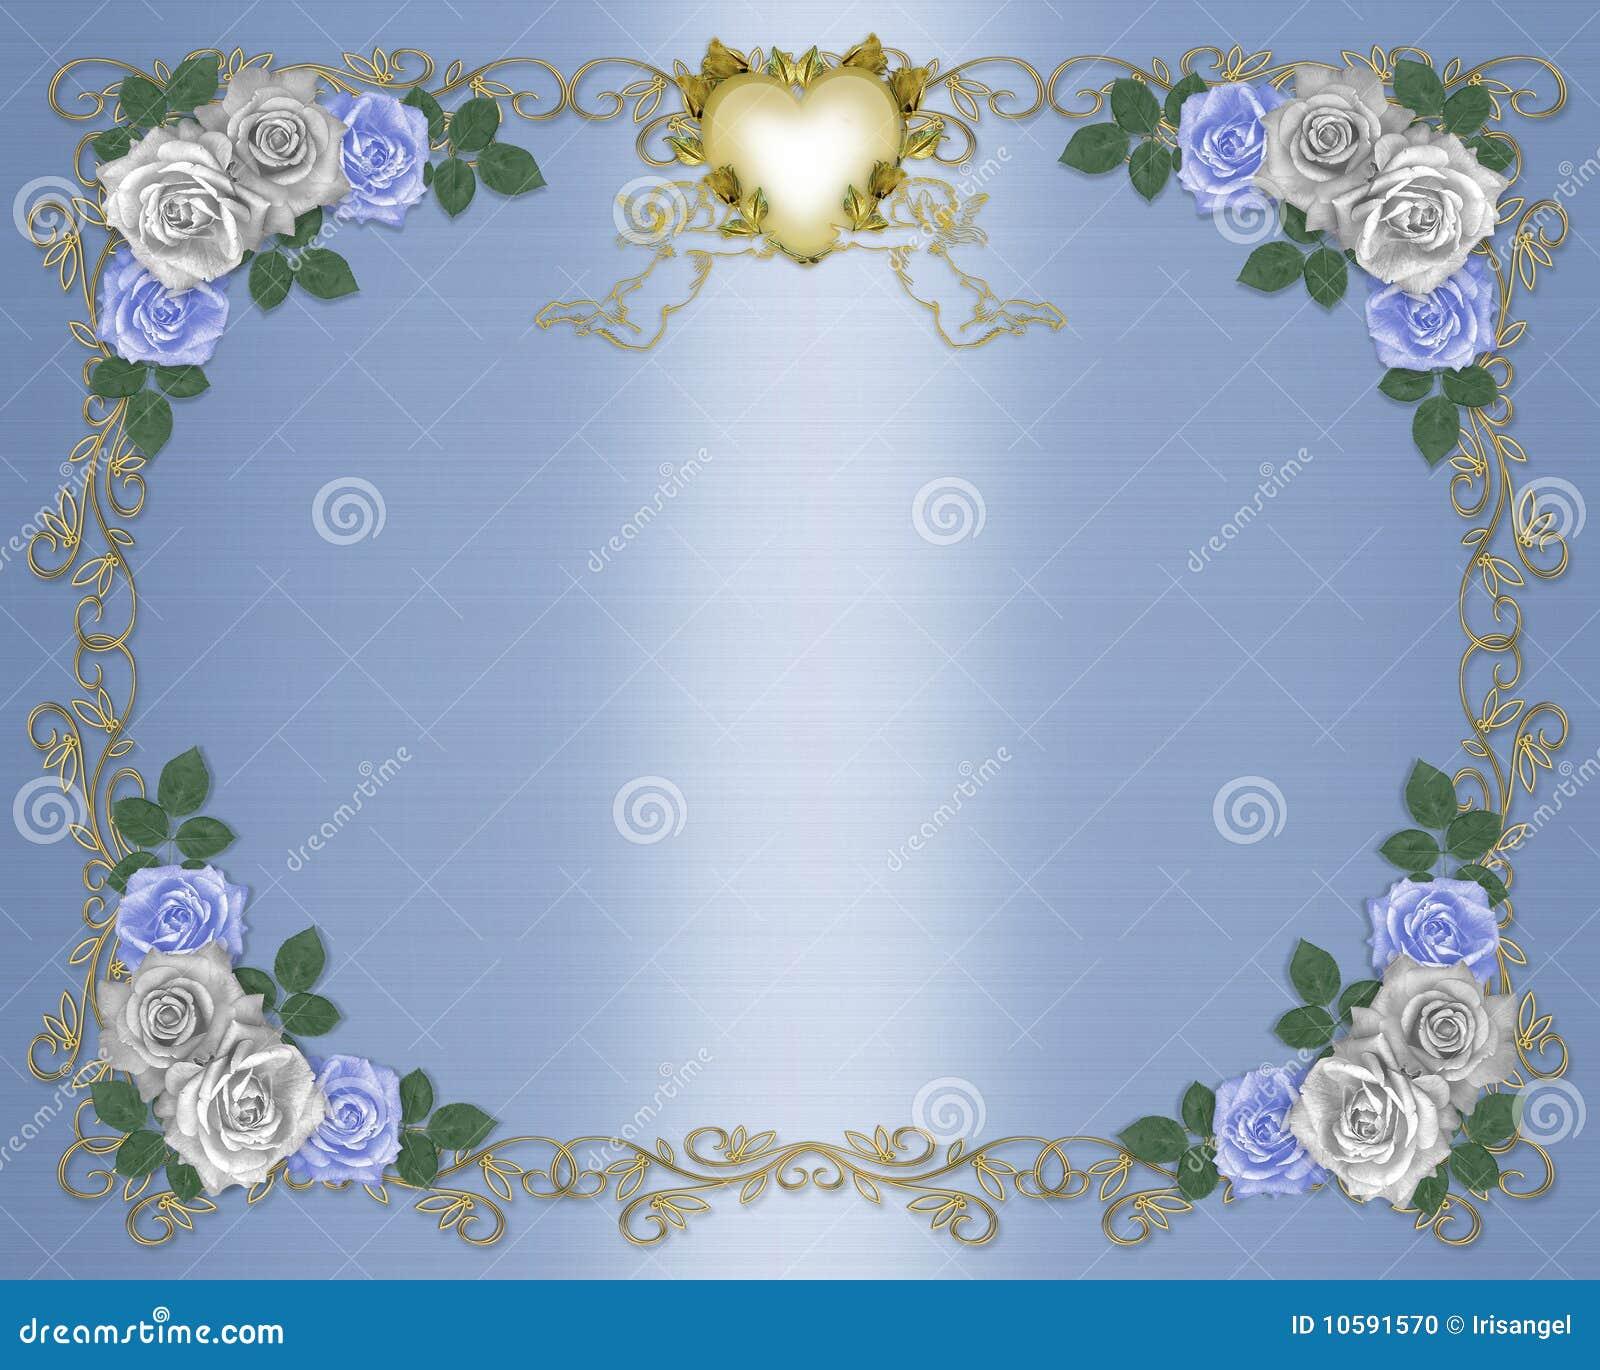 Wedding Invitation Border Blue Roses Stock Illustration